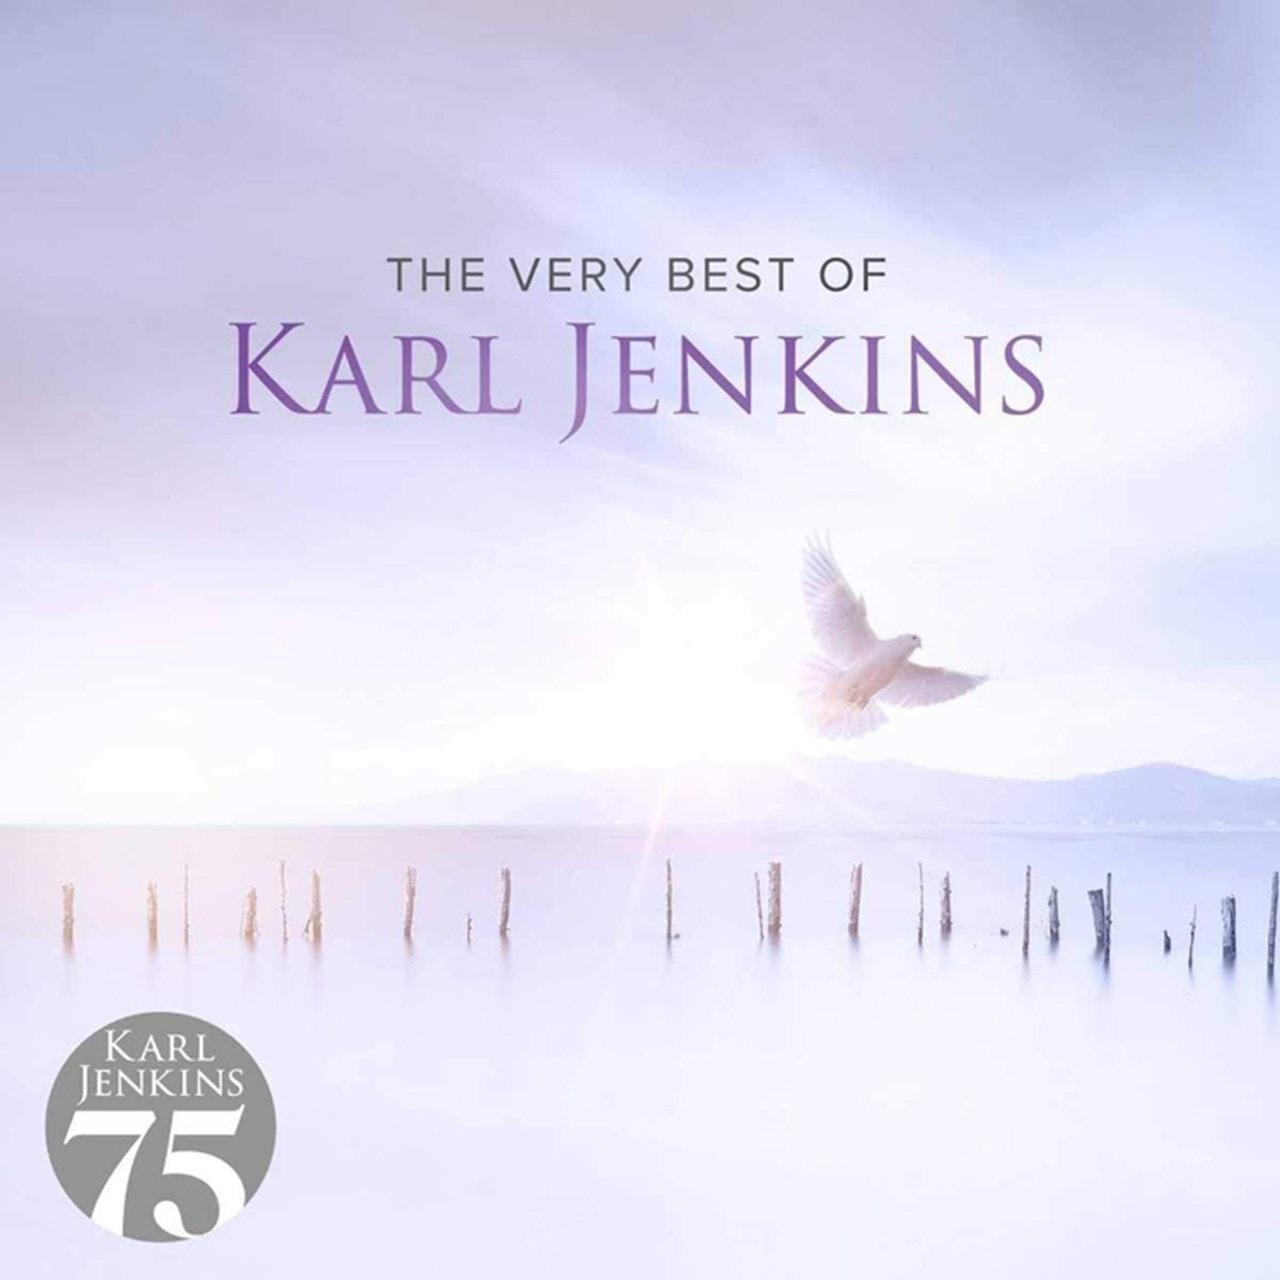 The Very Best of Karl Jenkins - 1